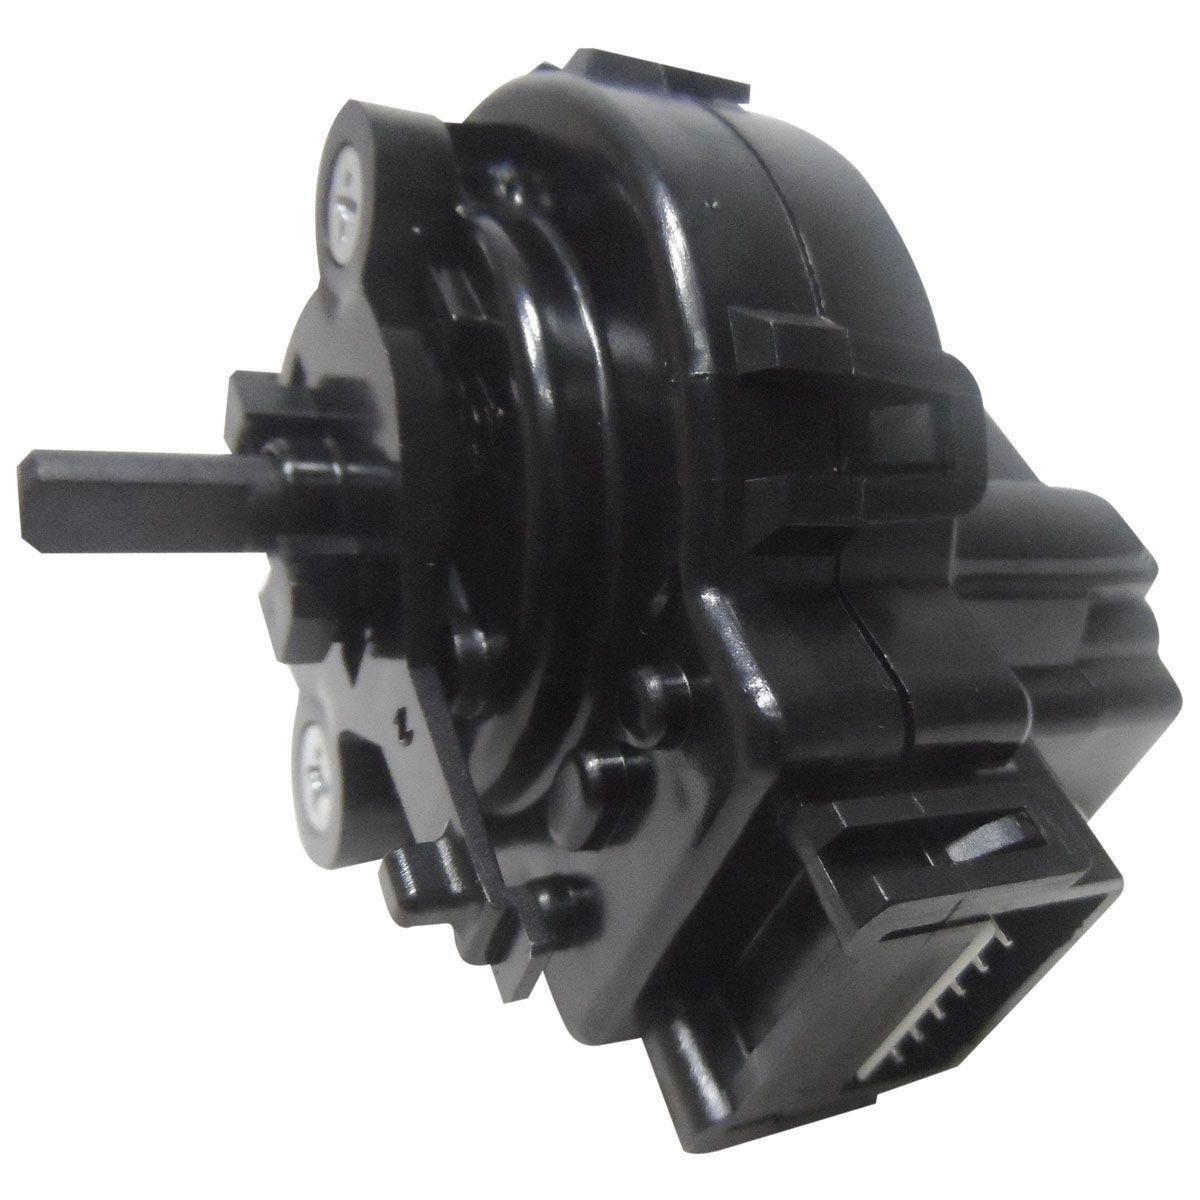 Chave Motorizada Mabe/Dako C/ SUP Bivolt